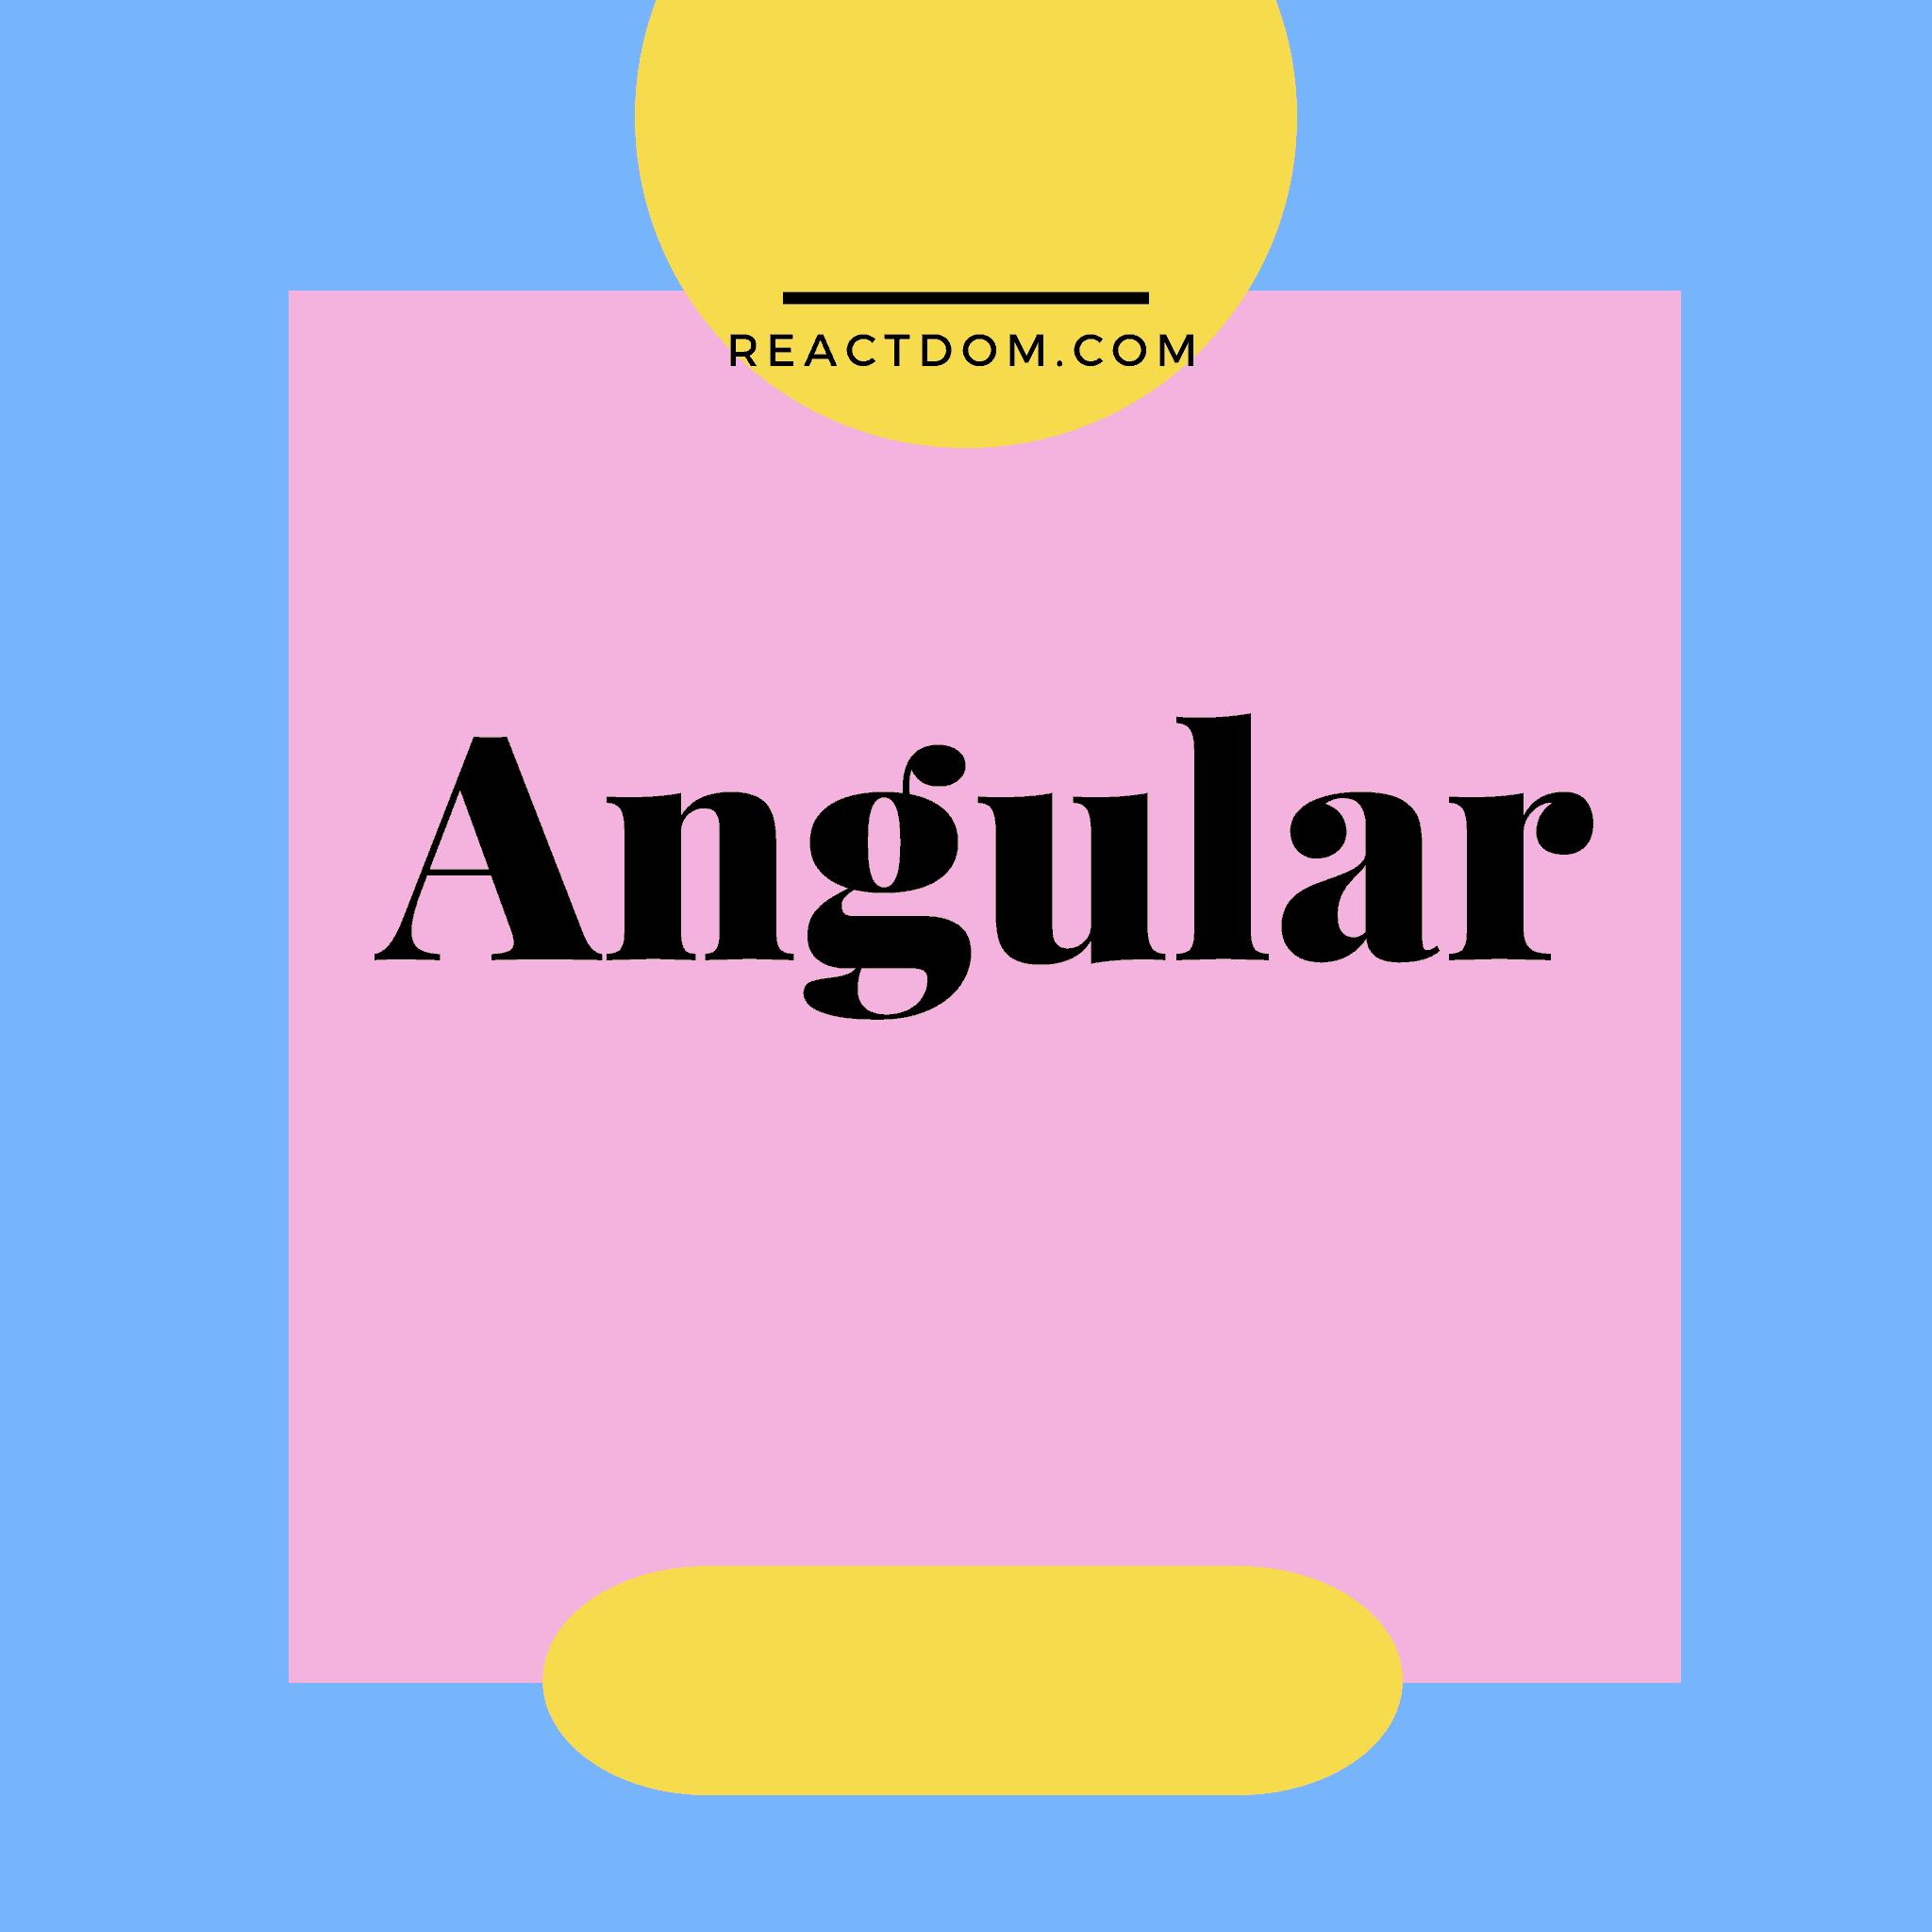 Learn Angular: Best Angular tutorials, courses & books 2019